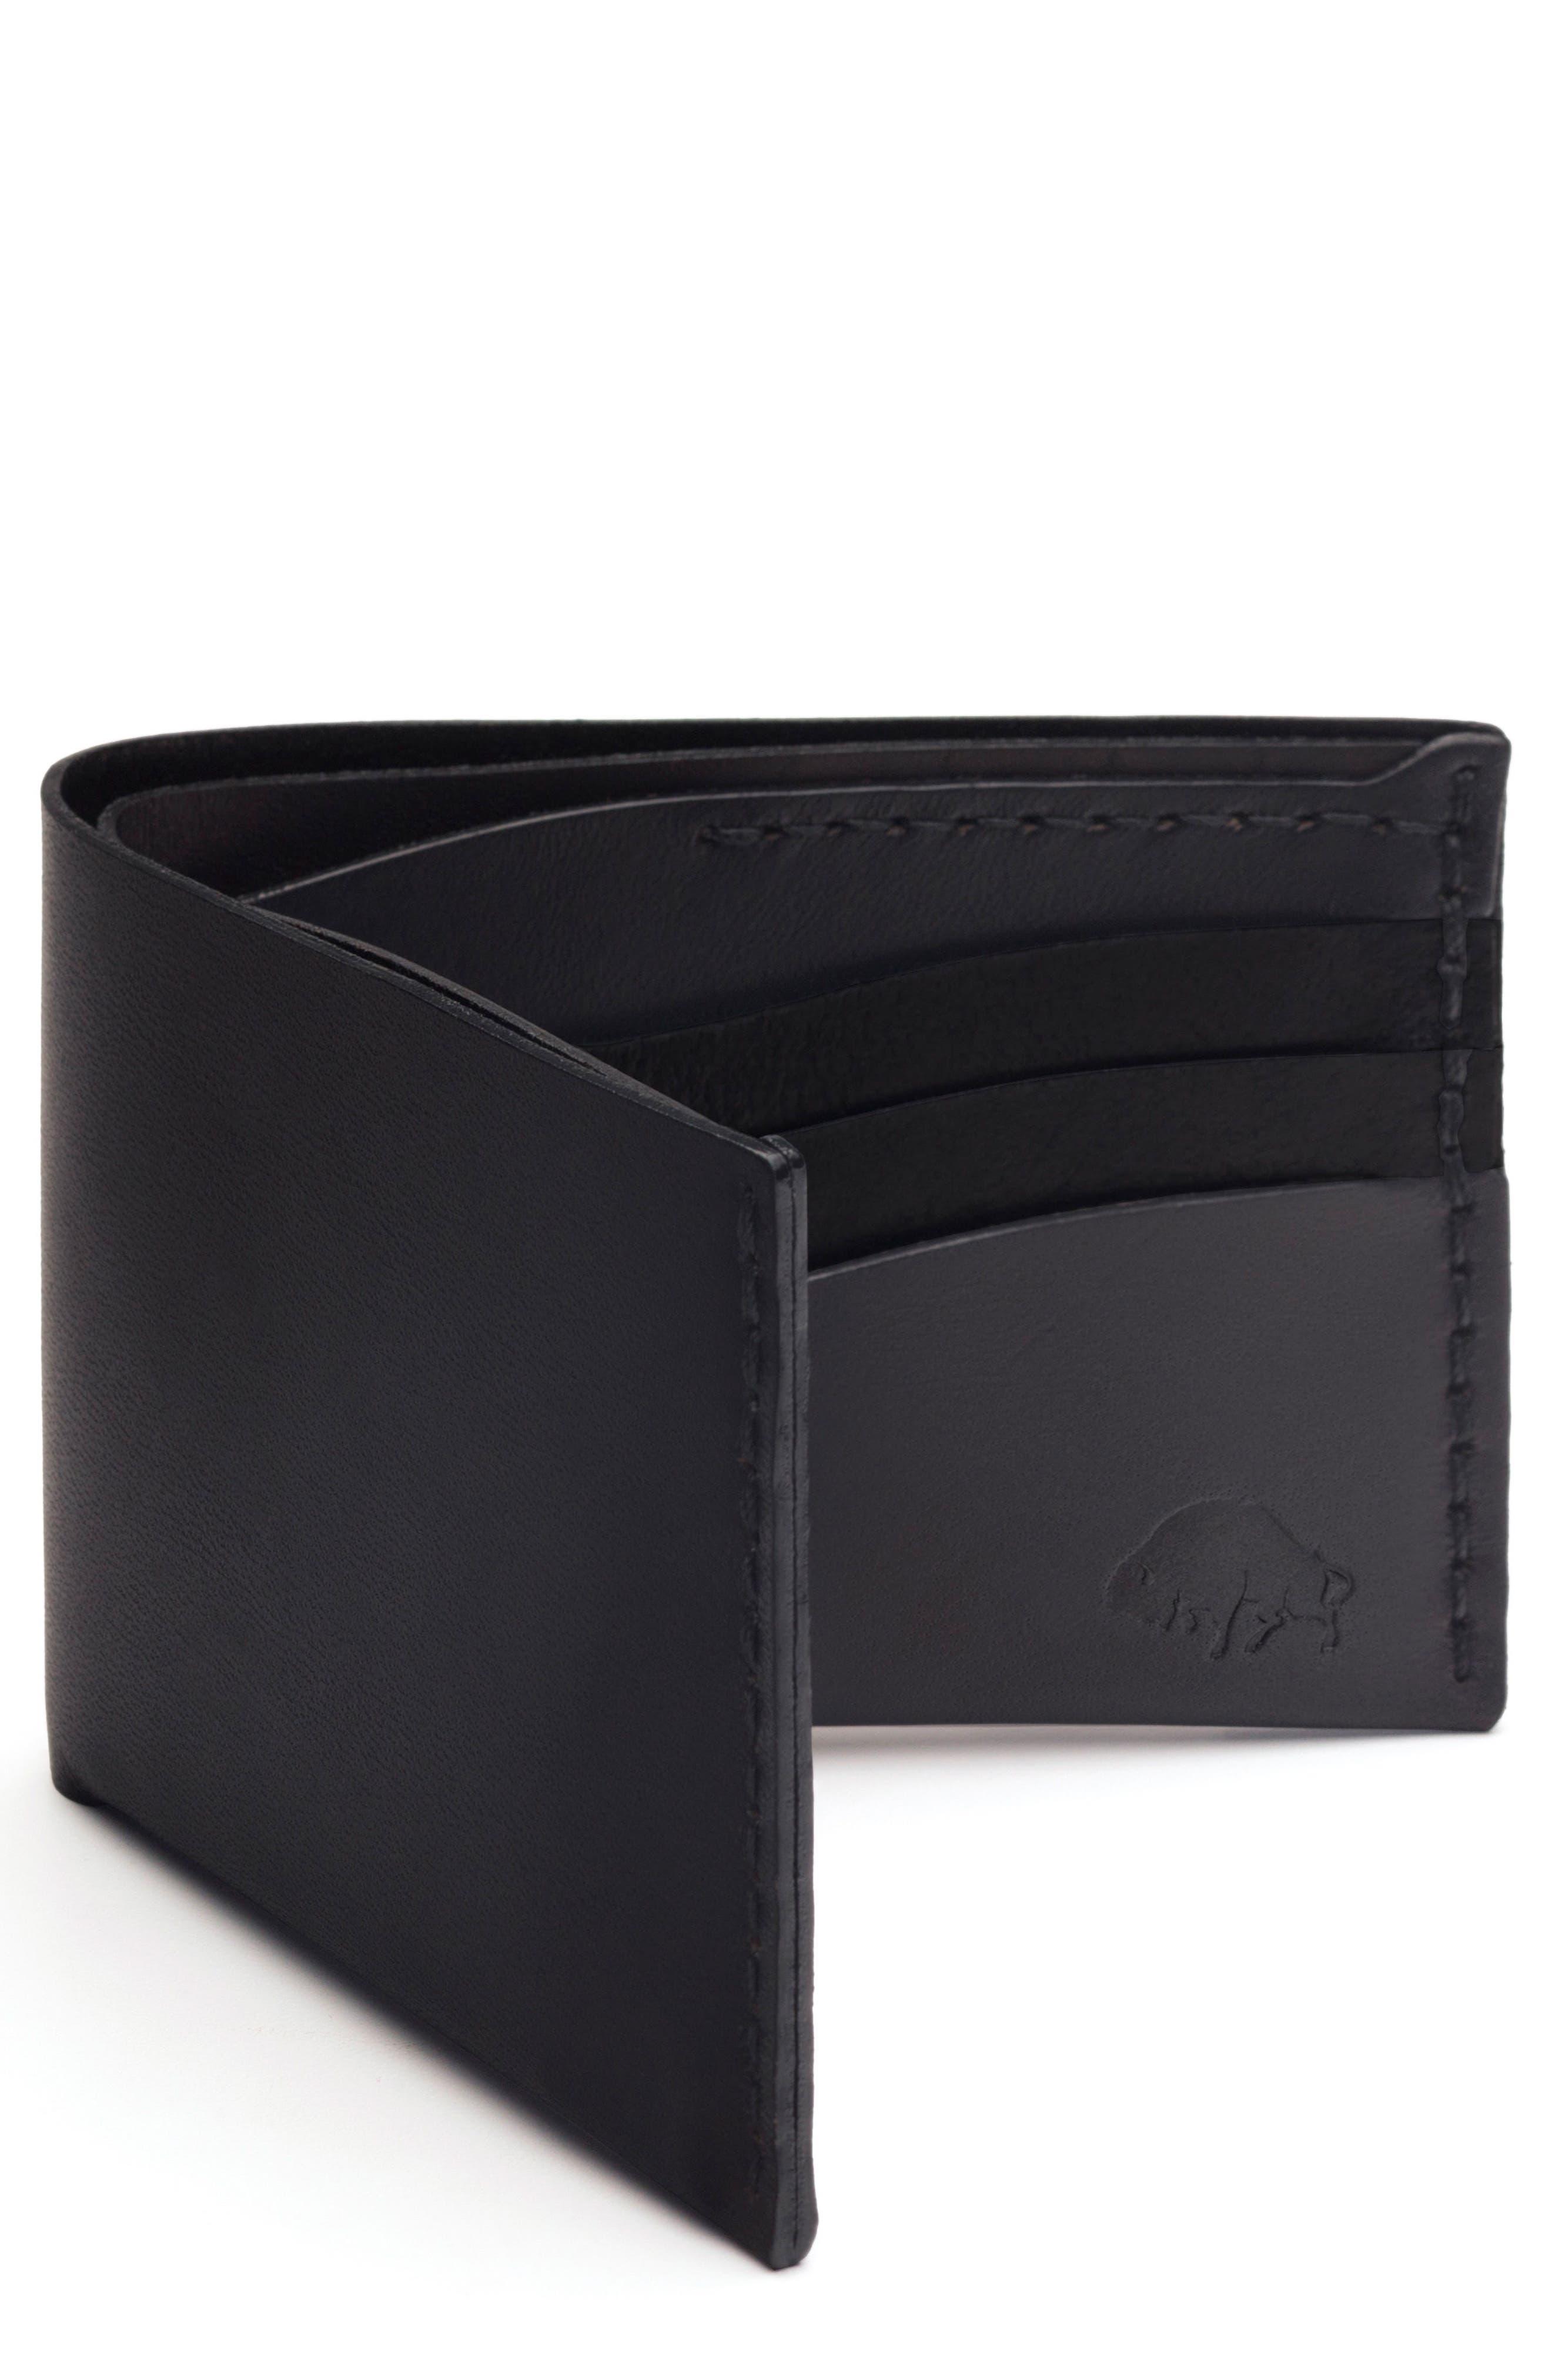 No. 8 Leather Wallet,                         Main,                         color, Jet